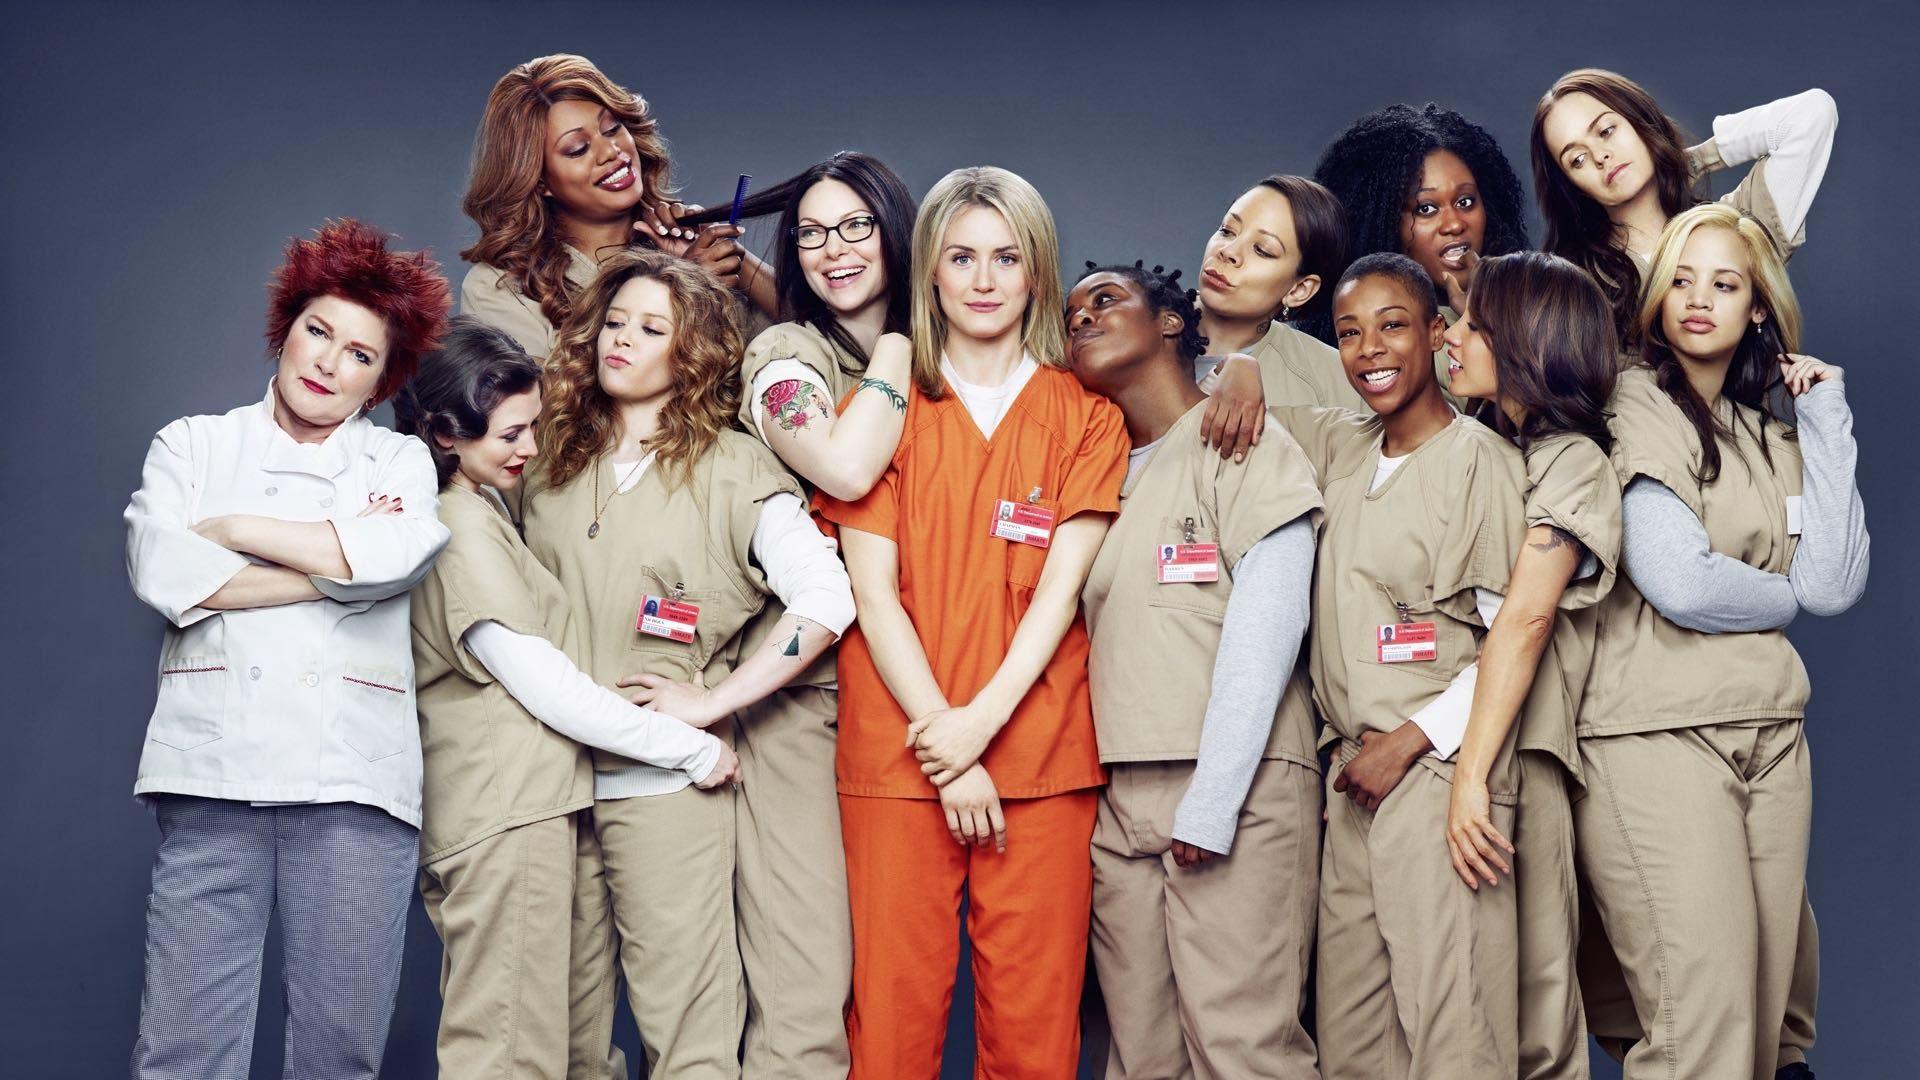 orange is the new black season 6 free